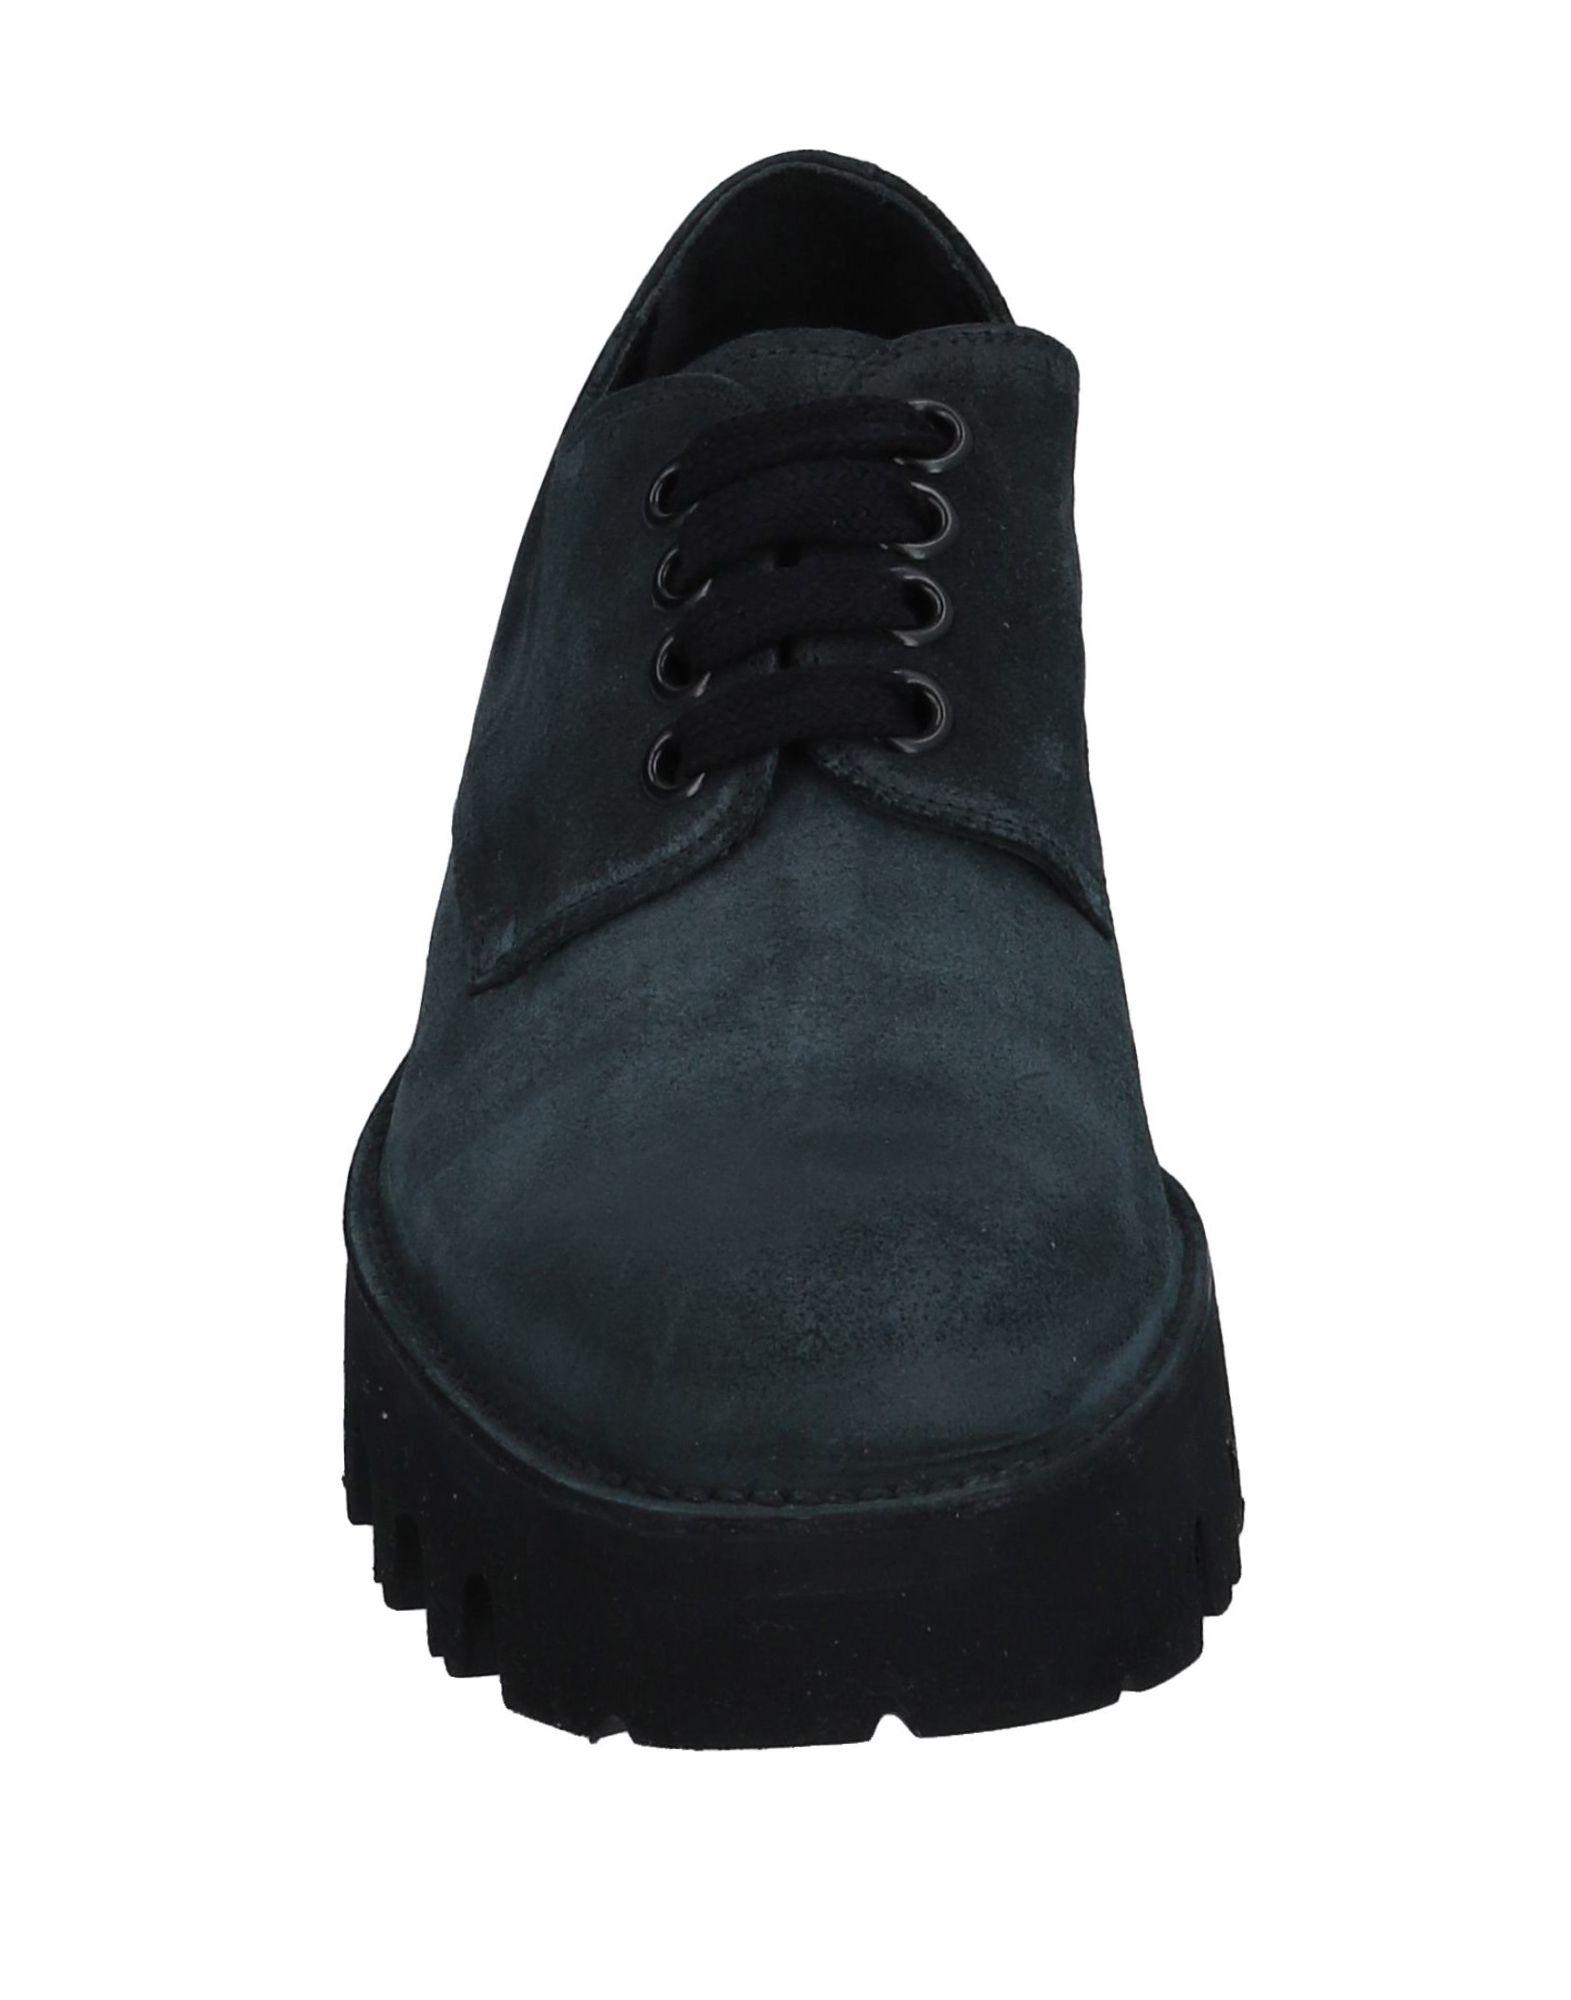 Rabatt Schuhe Schnürschuhe Rocco P. Schnürschuhe Schuhe Damen  11553737AM f2c8cb